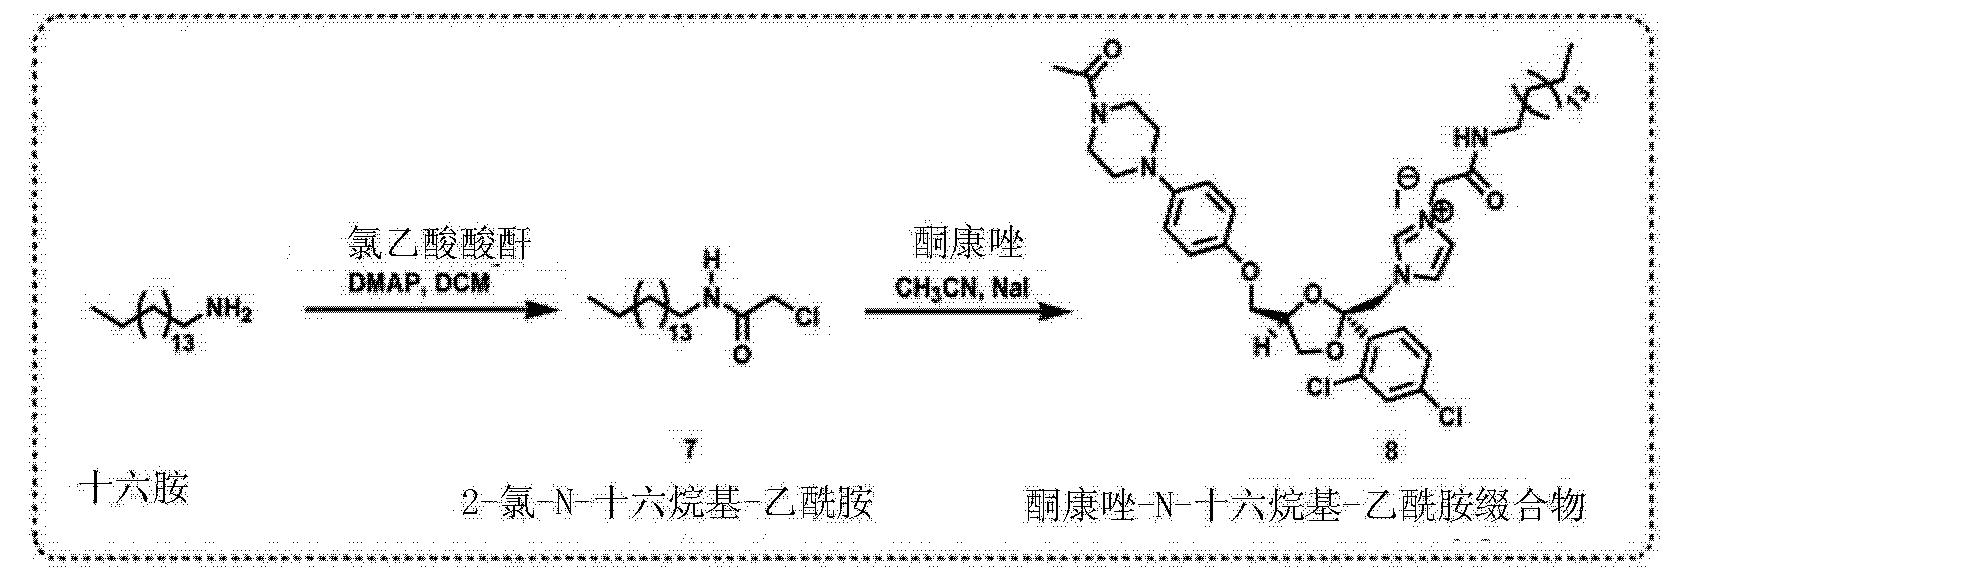 Figure CN103857440AD00701